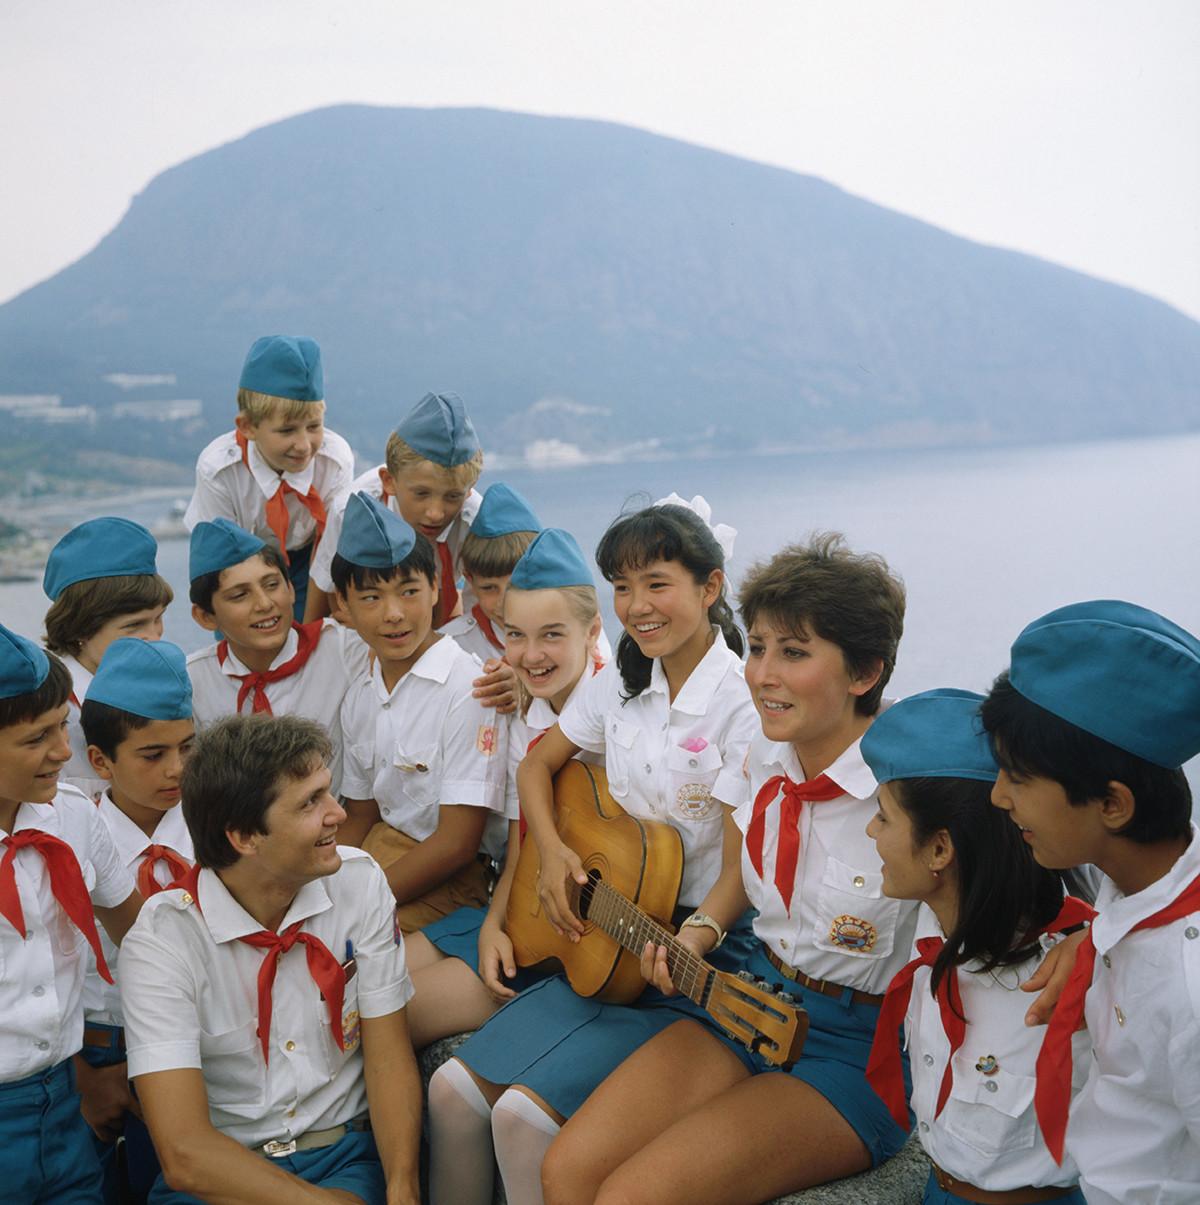 Artek summer camp in Crimea.